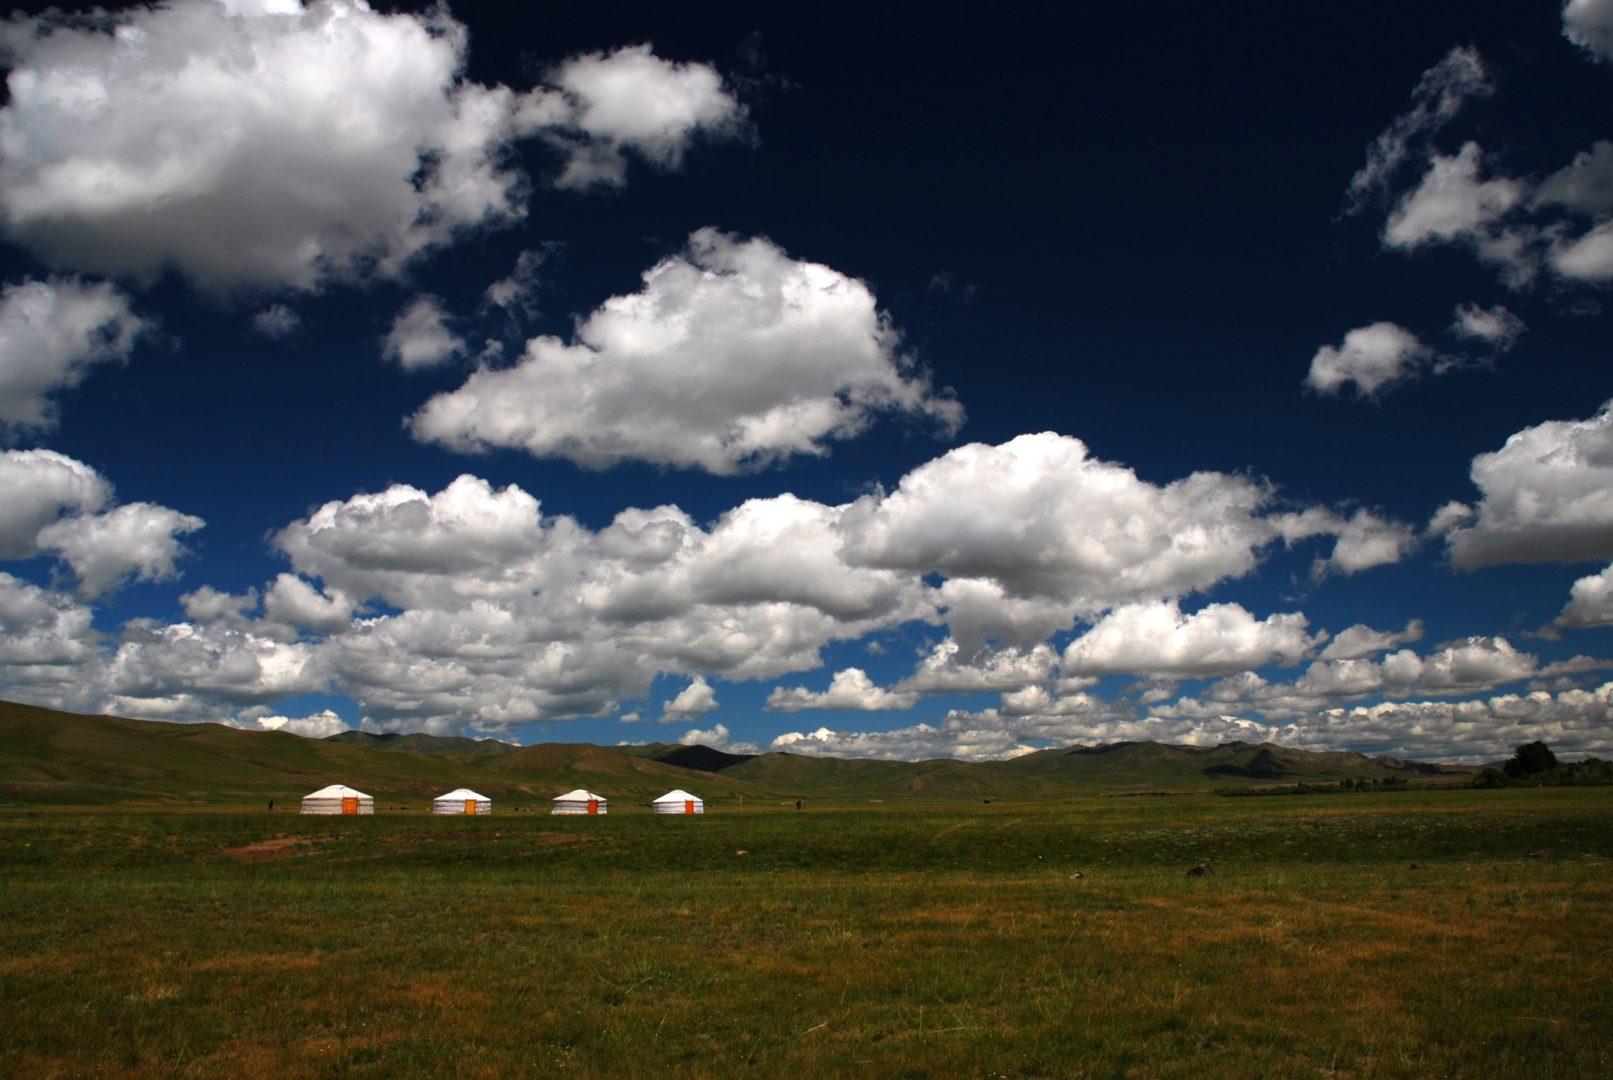 Mongolei-Reise: Rundreise in die Gobi